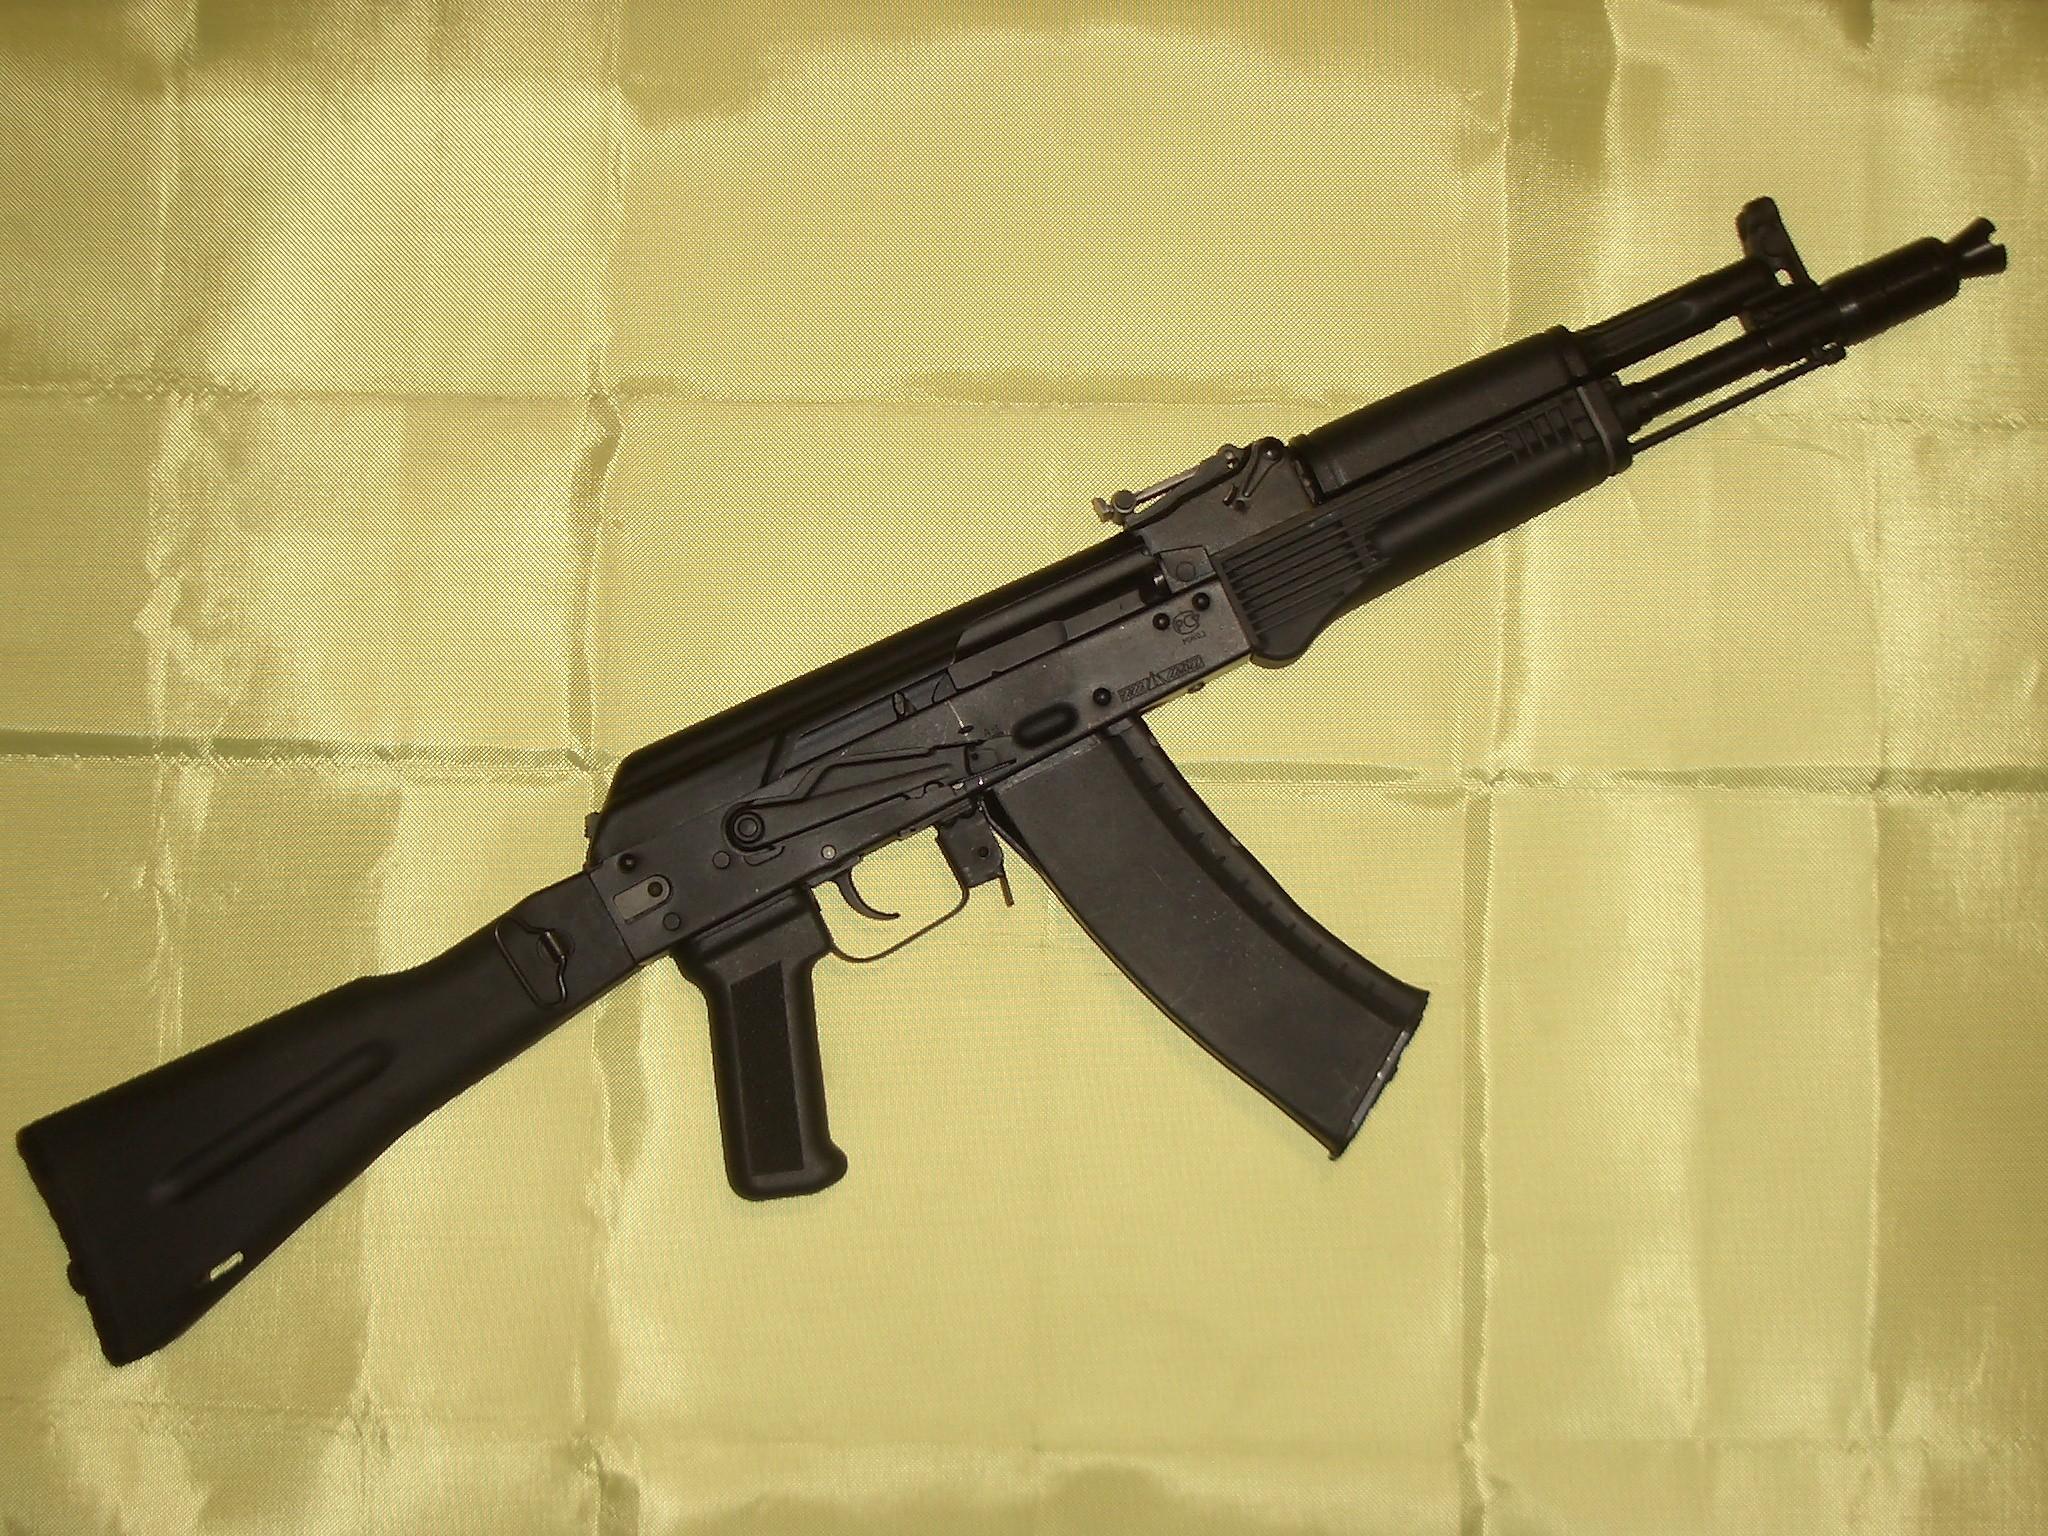 AK-105 Avtomat Kalashnikova